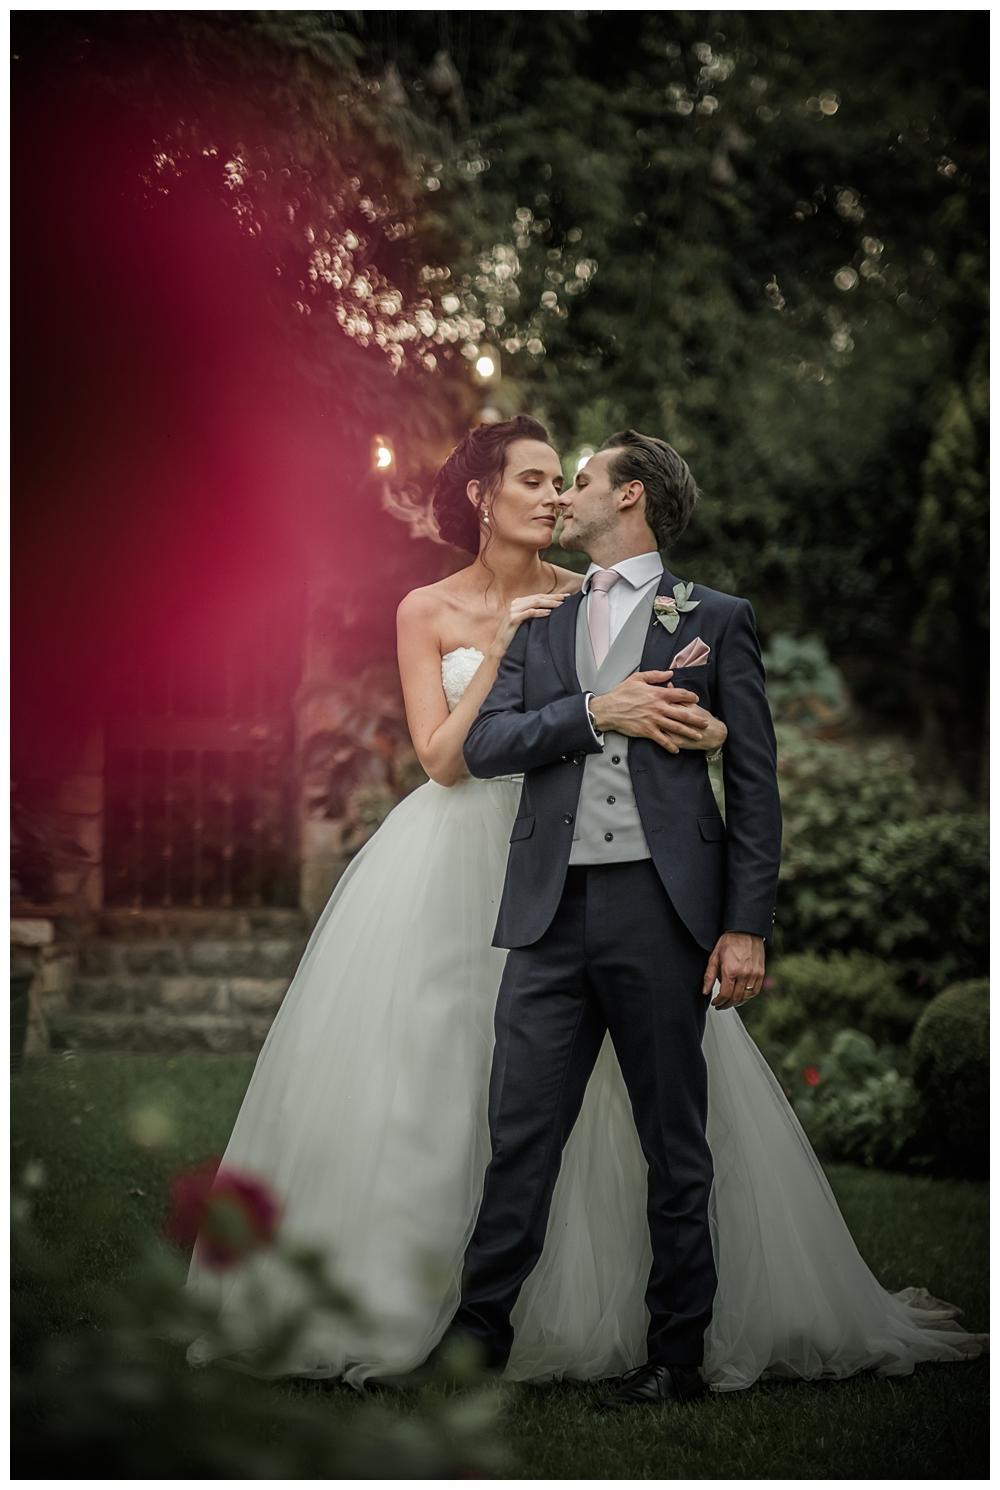 Best_Wedding_Photographer_AlexanderSmith_1213.jpg